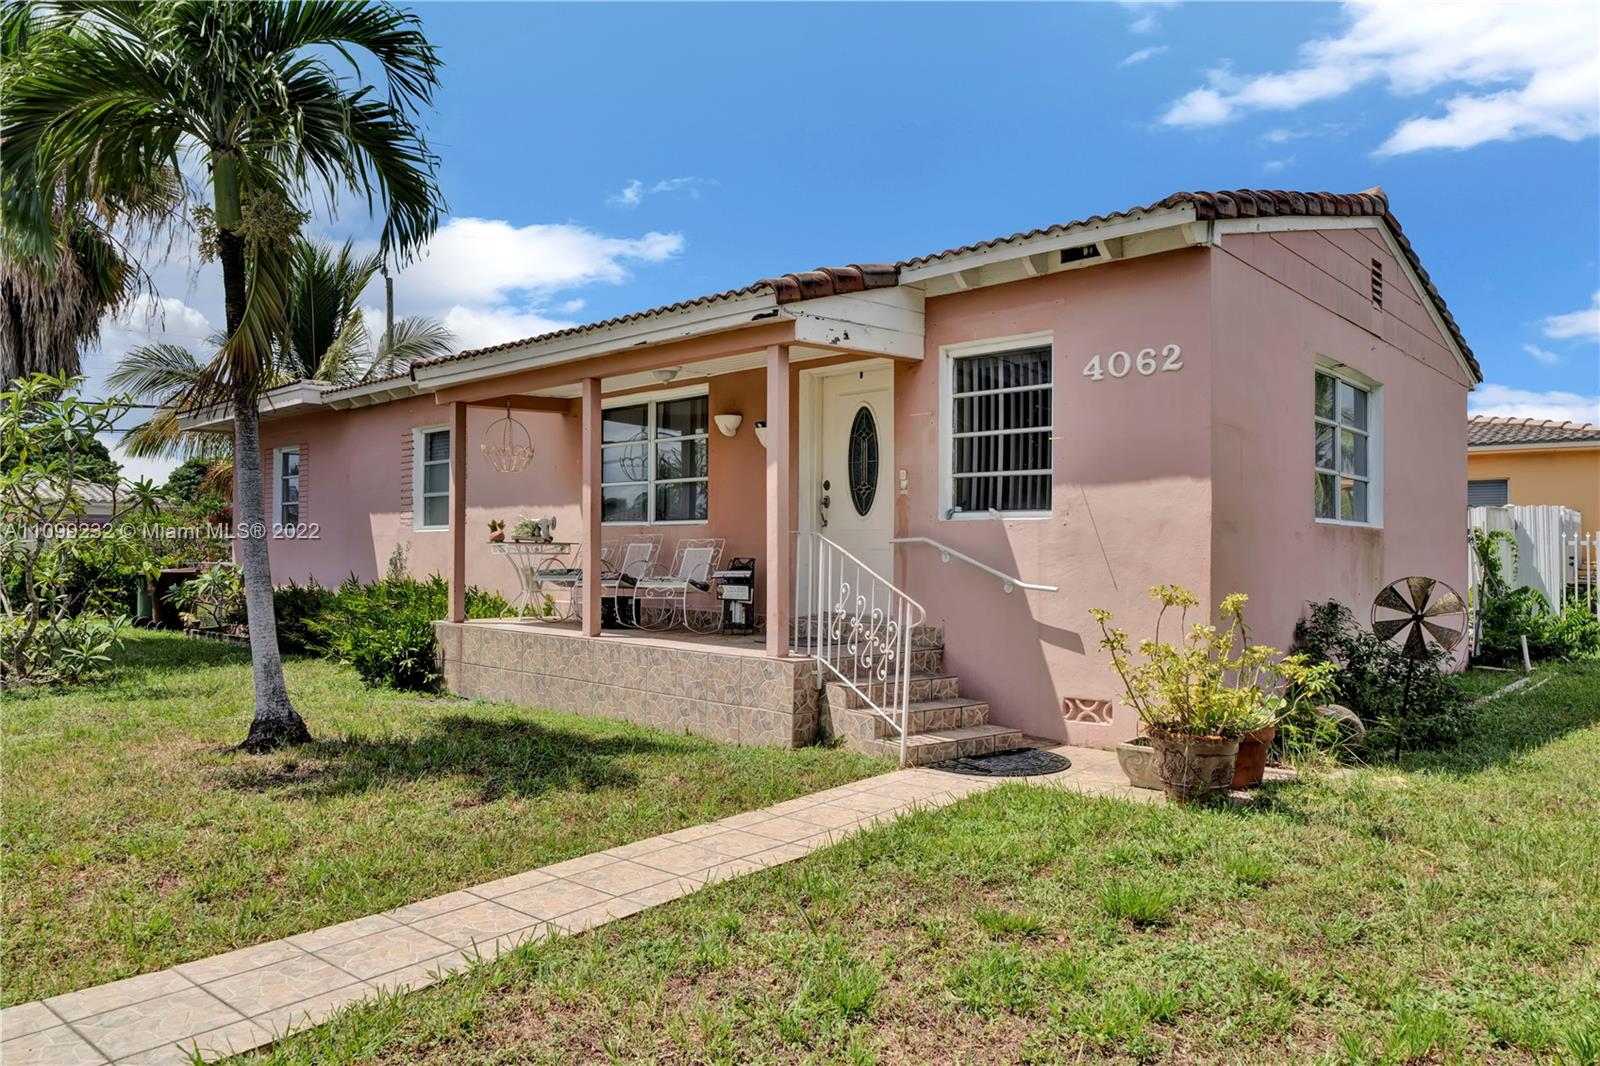 Single Family Home,For Sale,4062 E 1st Ave, Hialeah, Florida 33013,Brickell,realty,broker,condos near me